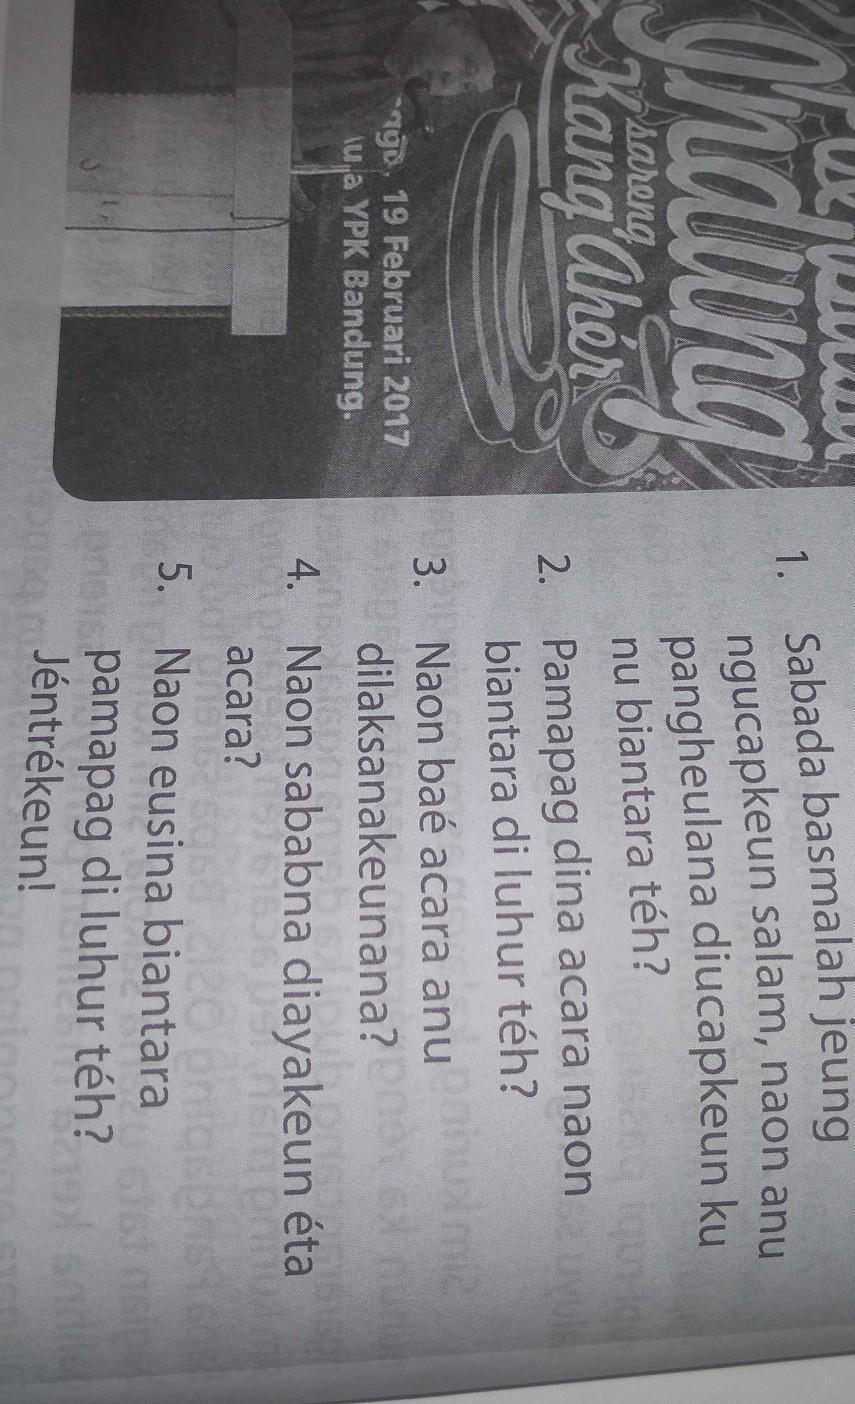 17/9/2020 · kunci jawaban bahasa sunda kelas 3 halaman 20 berikut ini kunci jawaban tema 3 kelas 3 halaman 210 212 2… pemetaan kd matematika kelas 6 semester 2 kurikulum 2013 revisi 2019 Pancen 1 Bahasa Sunda Kls 9 Hal 4 Help Me Please Brainly Co Id